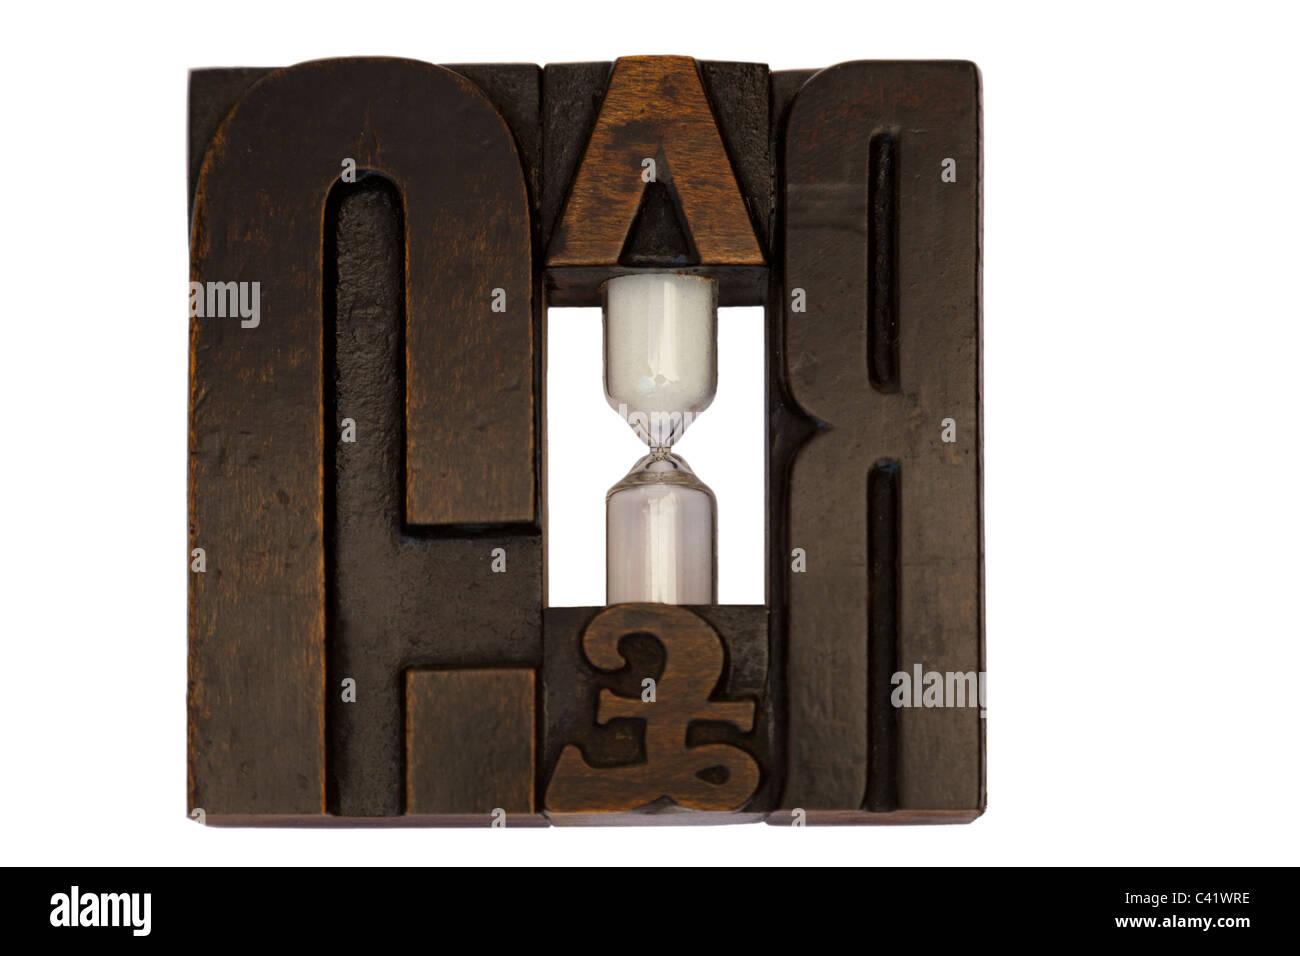 Alte hölzerne Drucke in eine Sanduhr Stand (England) Vieux Caractères d'imprimerie Recyclés En Stockbild